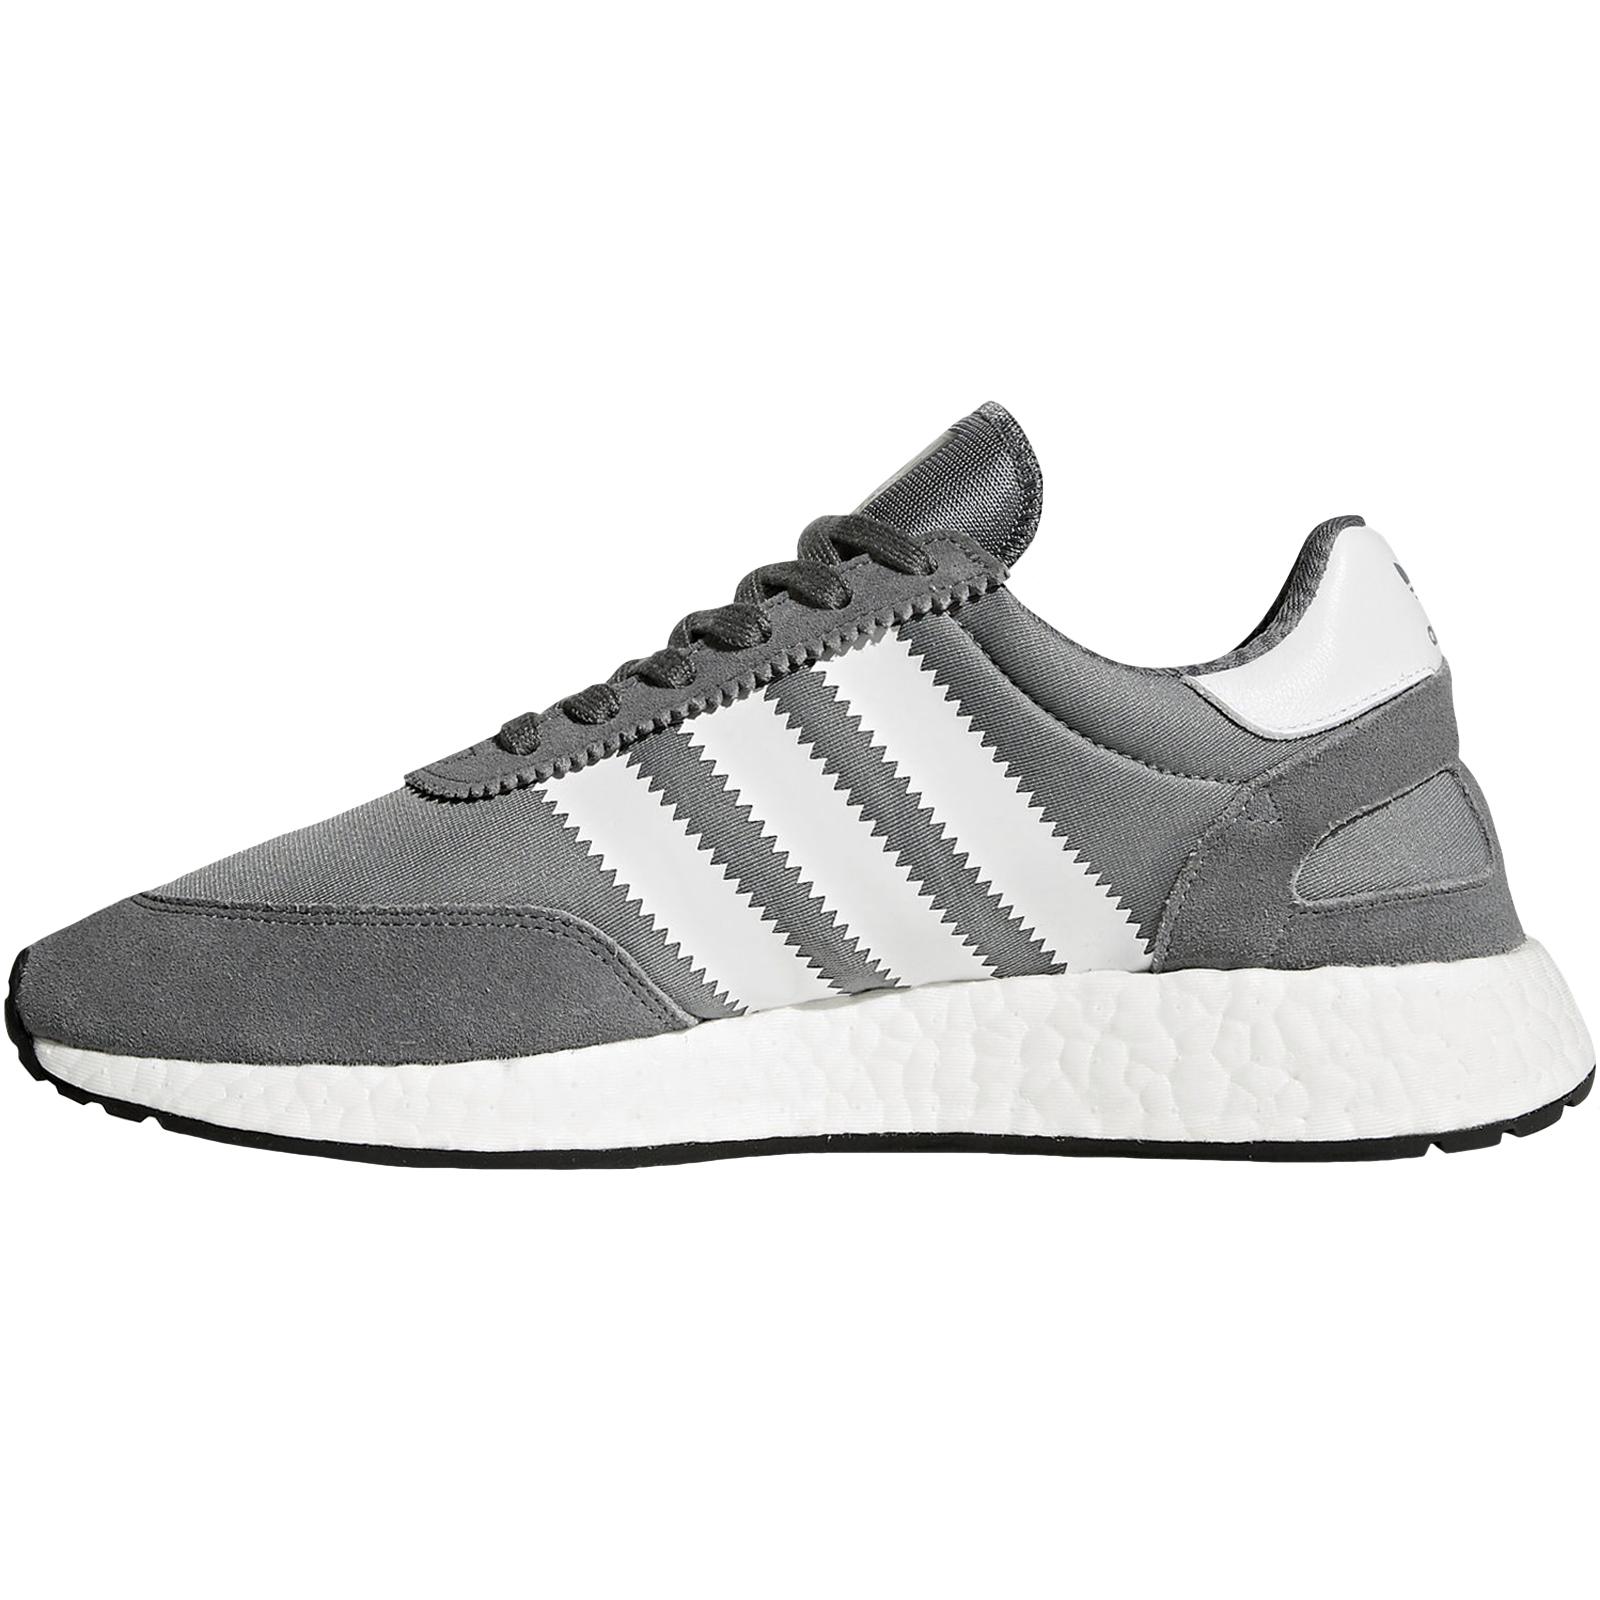 Business Schuhe : Online Verkauf adidas Originals INIKI I